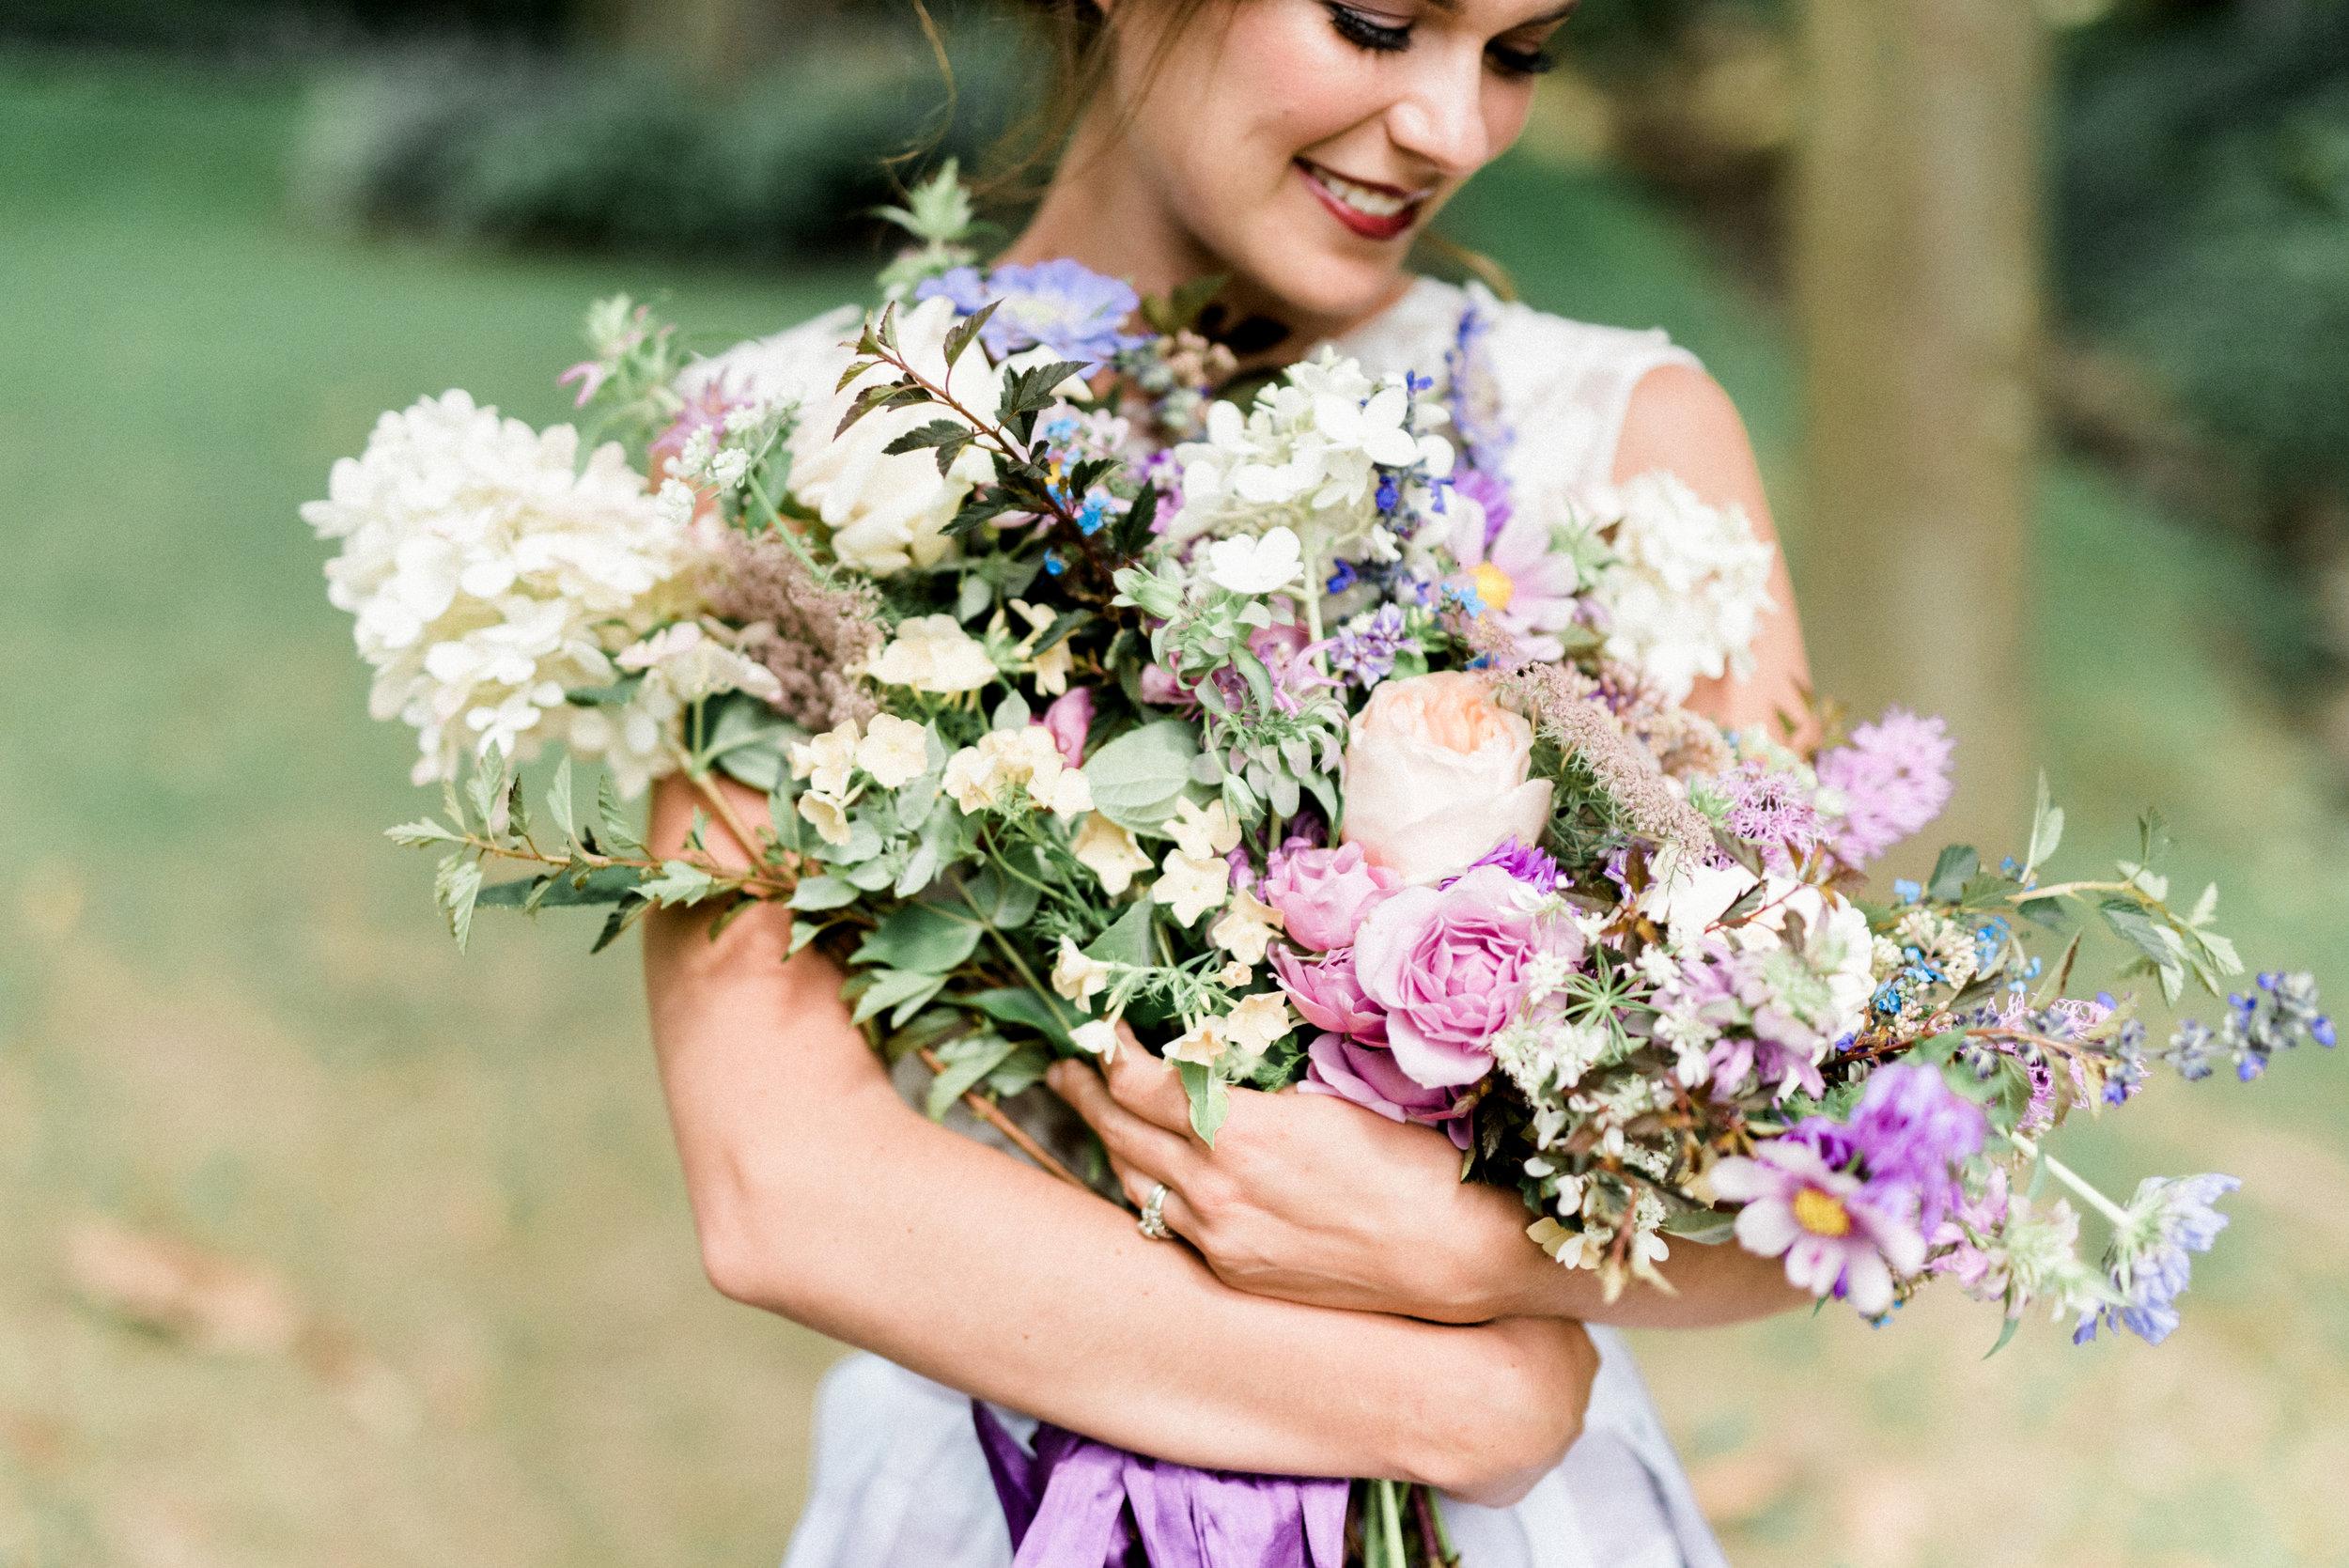 haley-richter-photography-pomme-lavender-wedding-inspiration-014.jpg